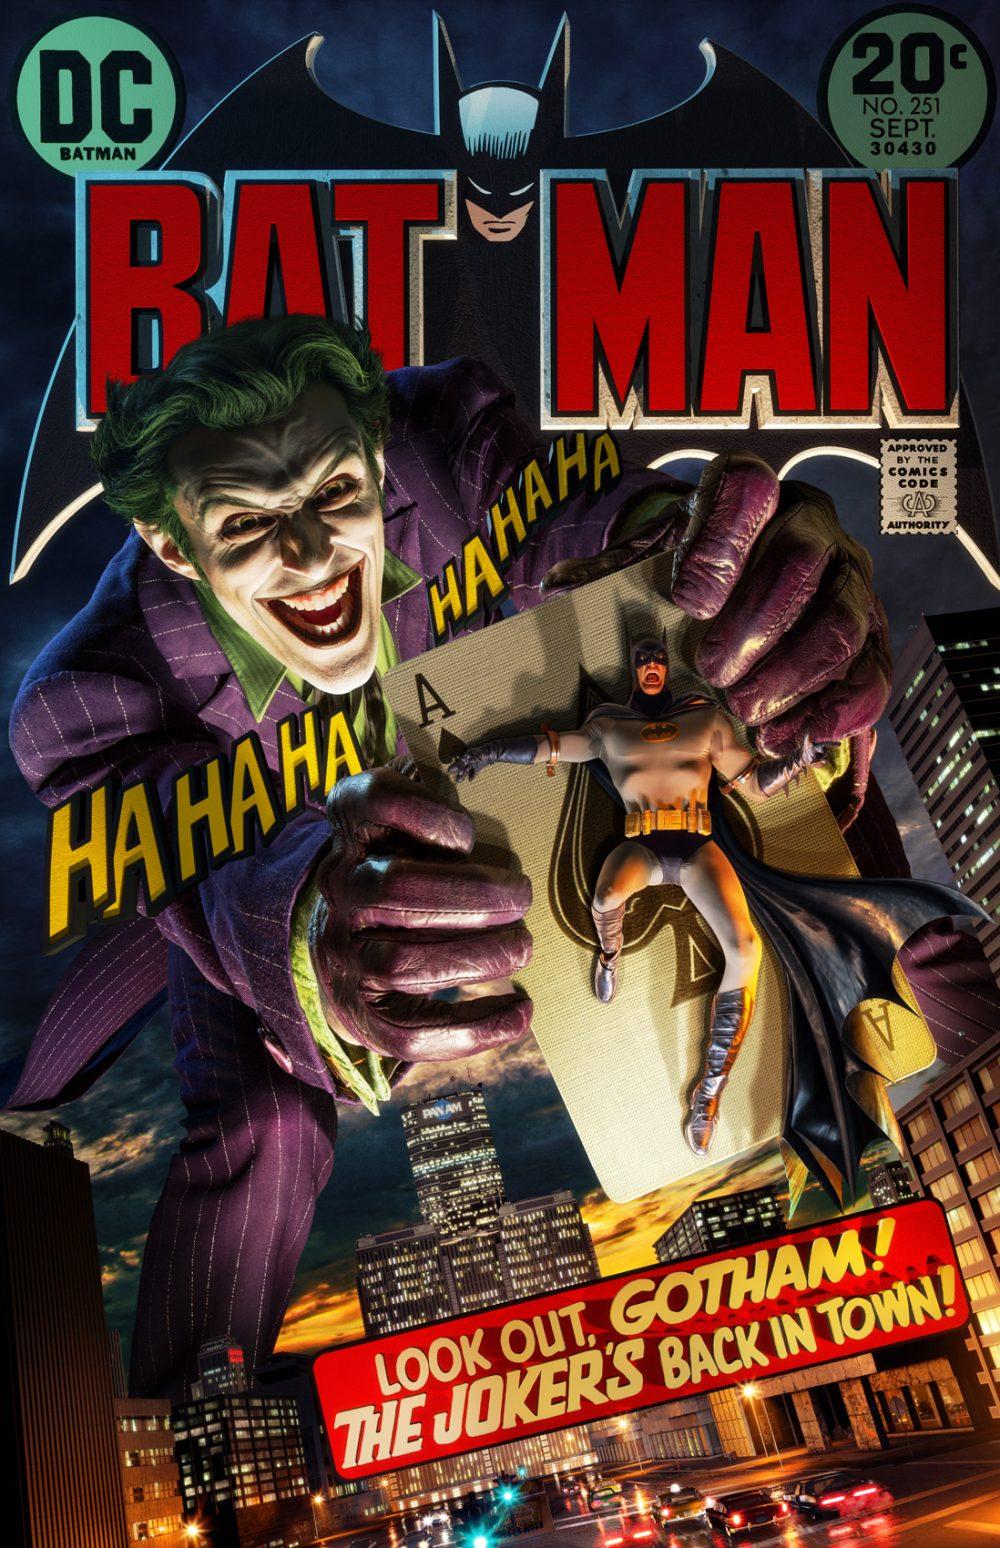 Batman #251, tributo di Harley's Joker